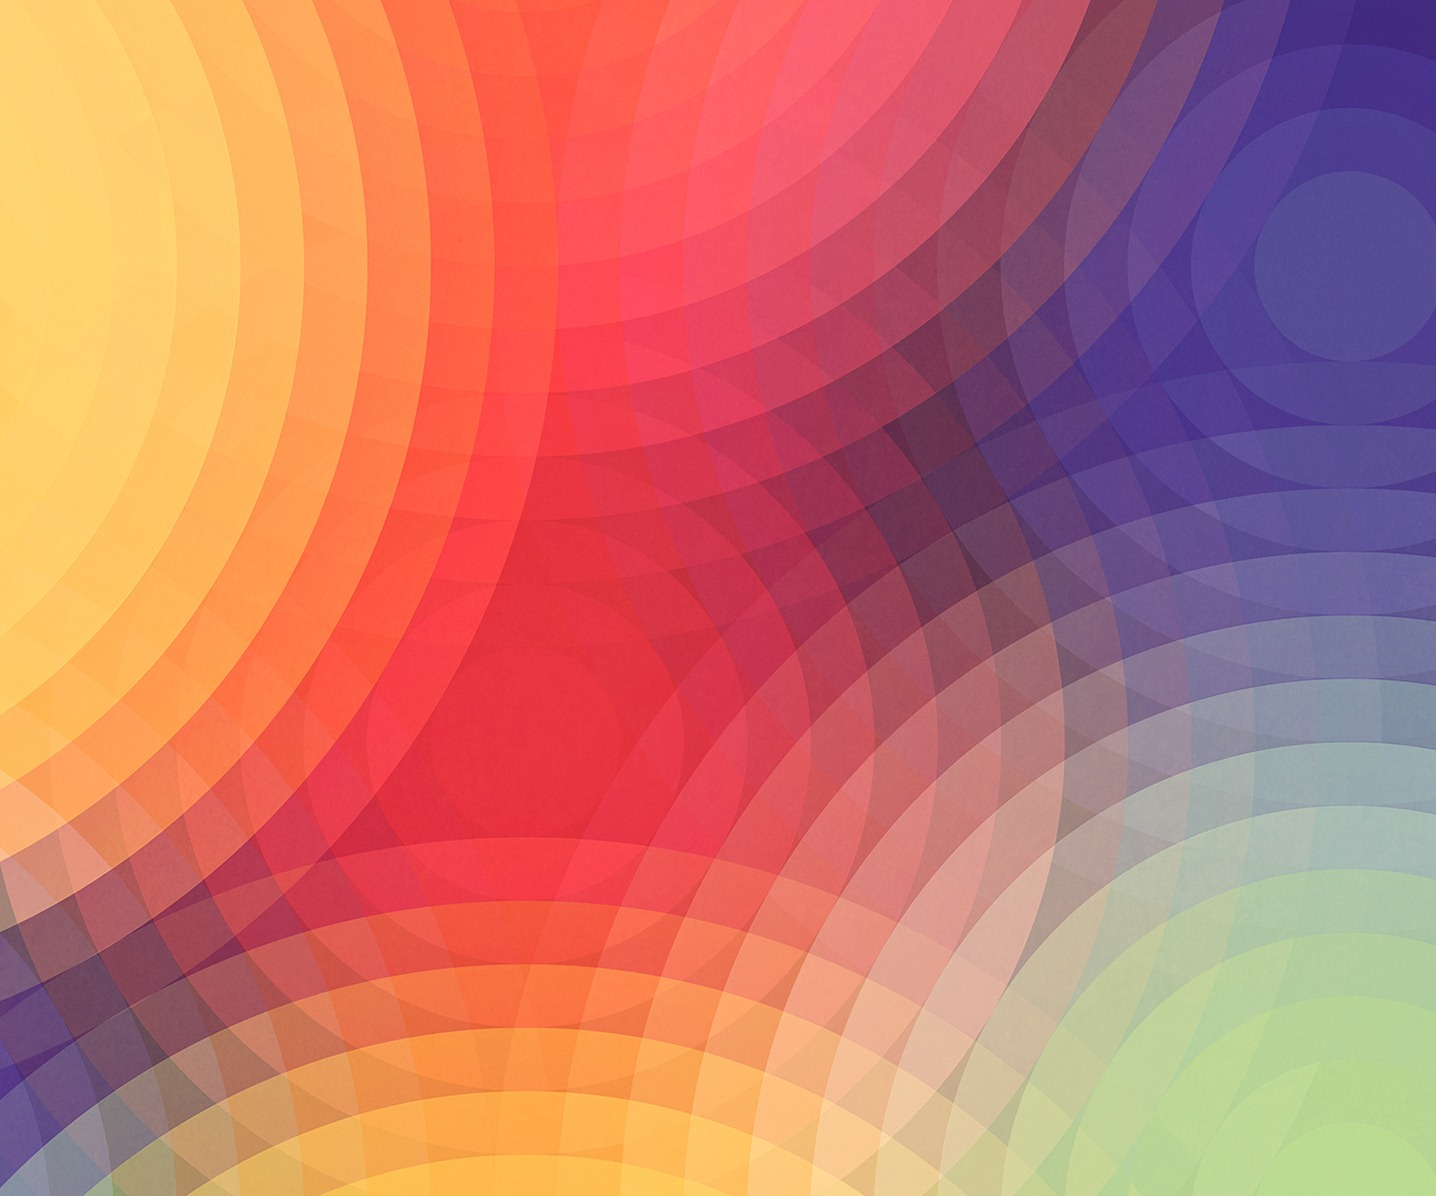 Free Nexus Wallpaper Android Gambar Keren